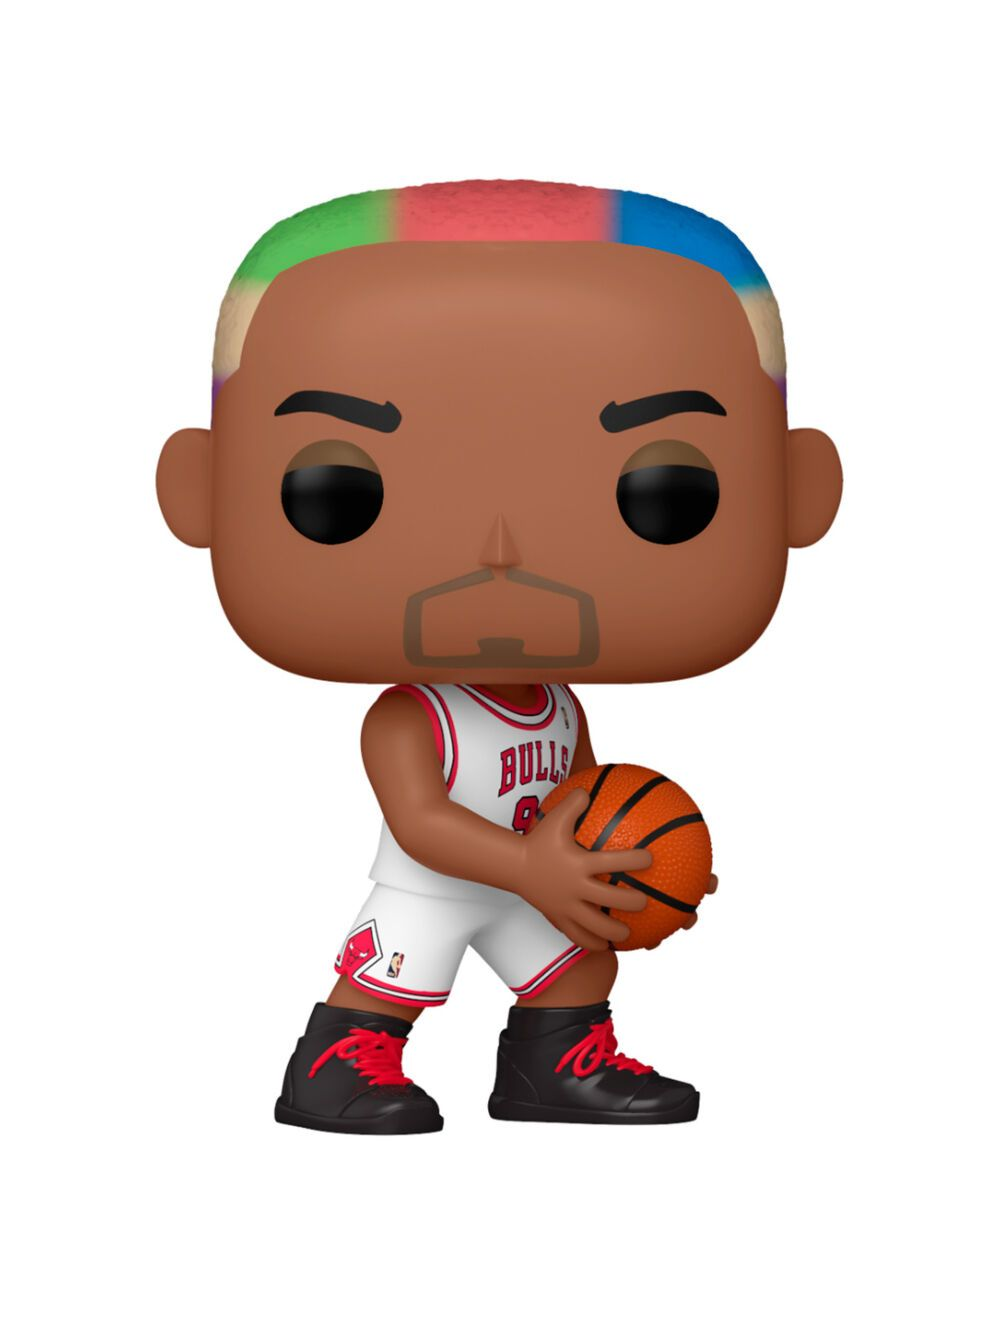 Funko POP! NBA Legends Dennis Rodman Bulls Vinyl 10 cm figura